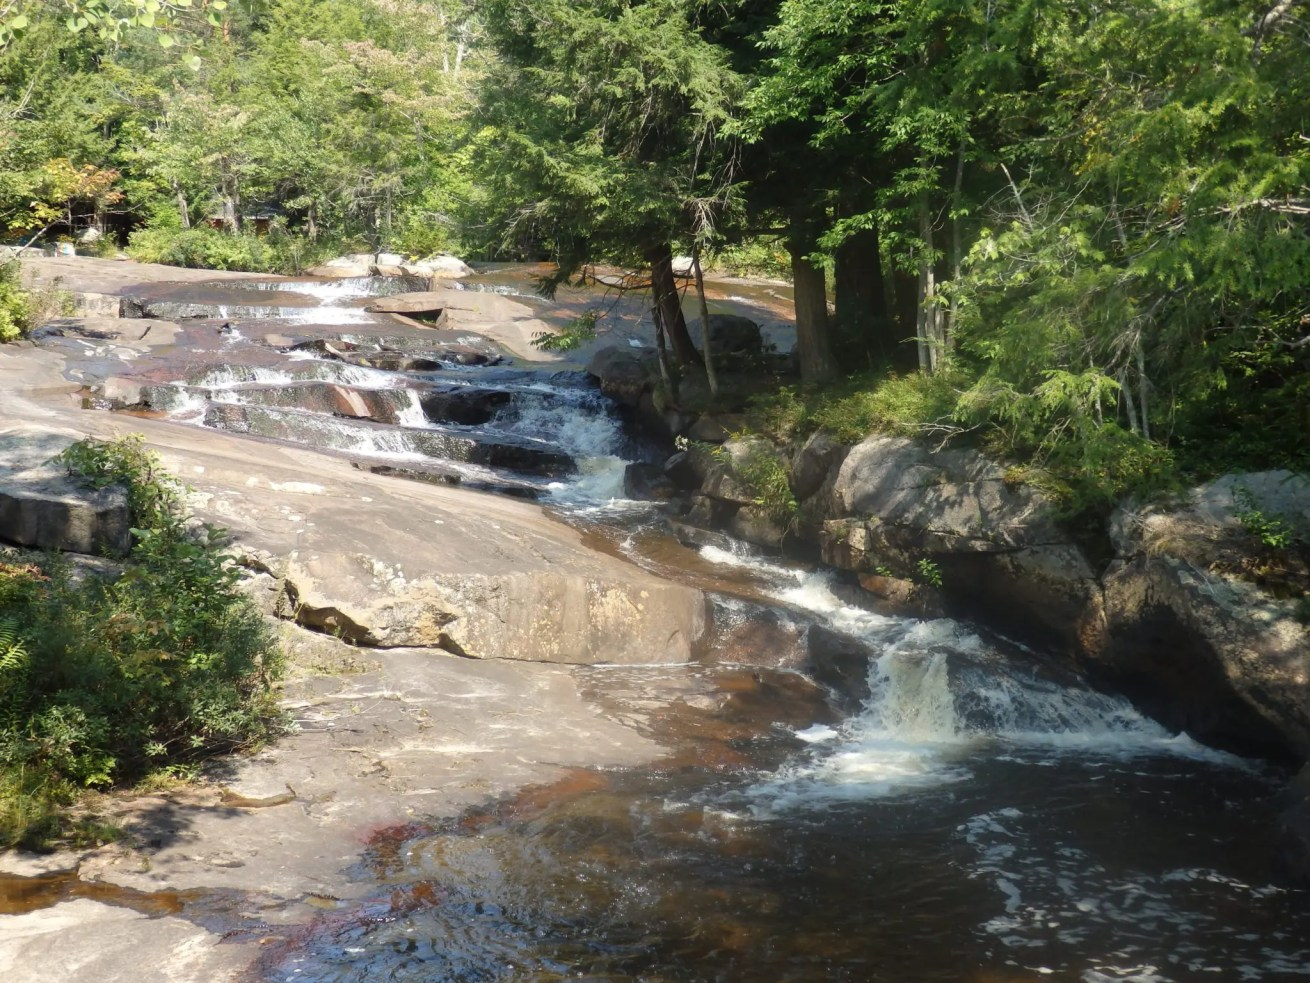 Twin Bridge Falls, Lewis County, New York